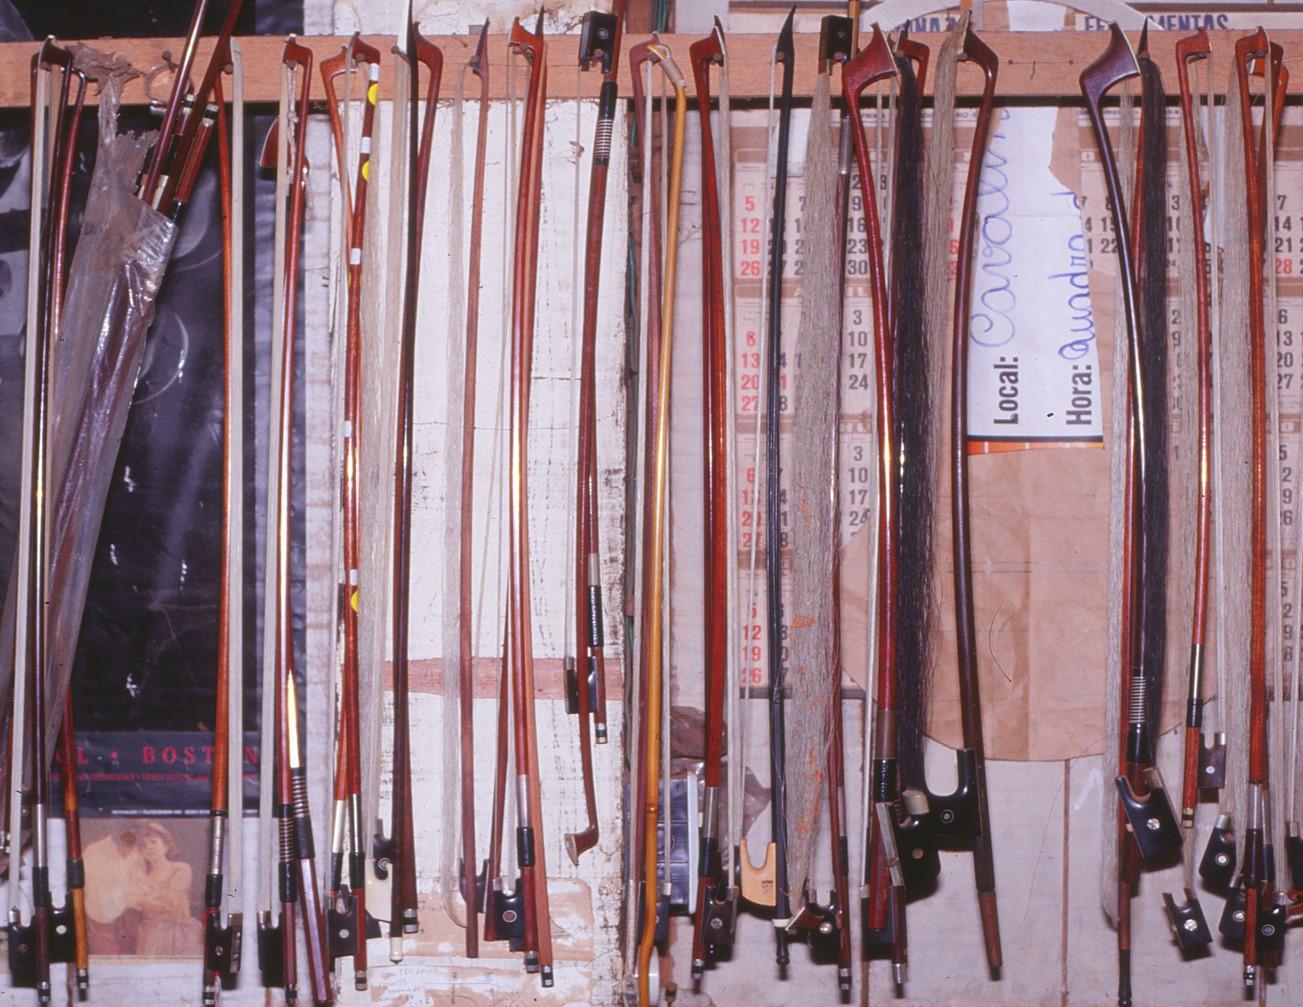 Antique violin bows made from Paubrasilia echinata (Image: G.P. Lewis)